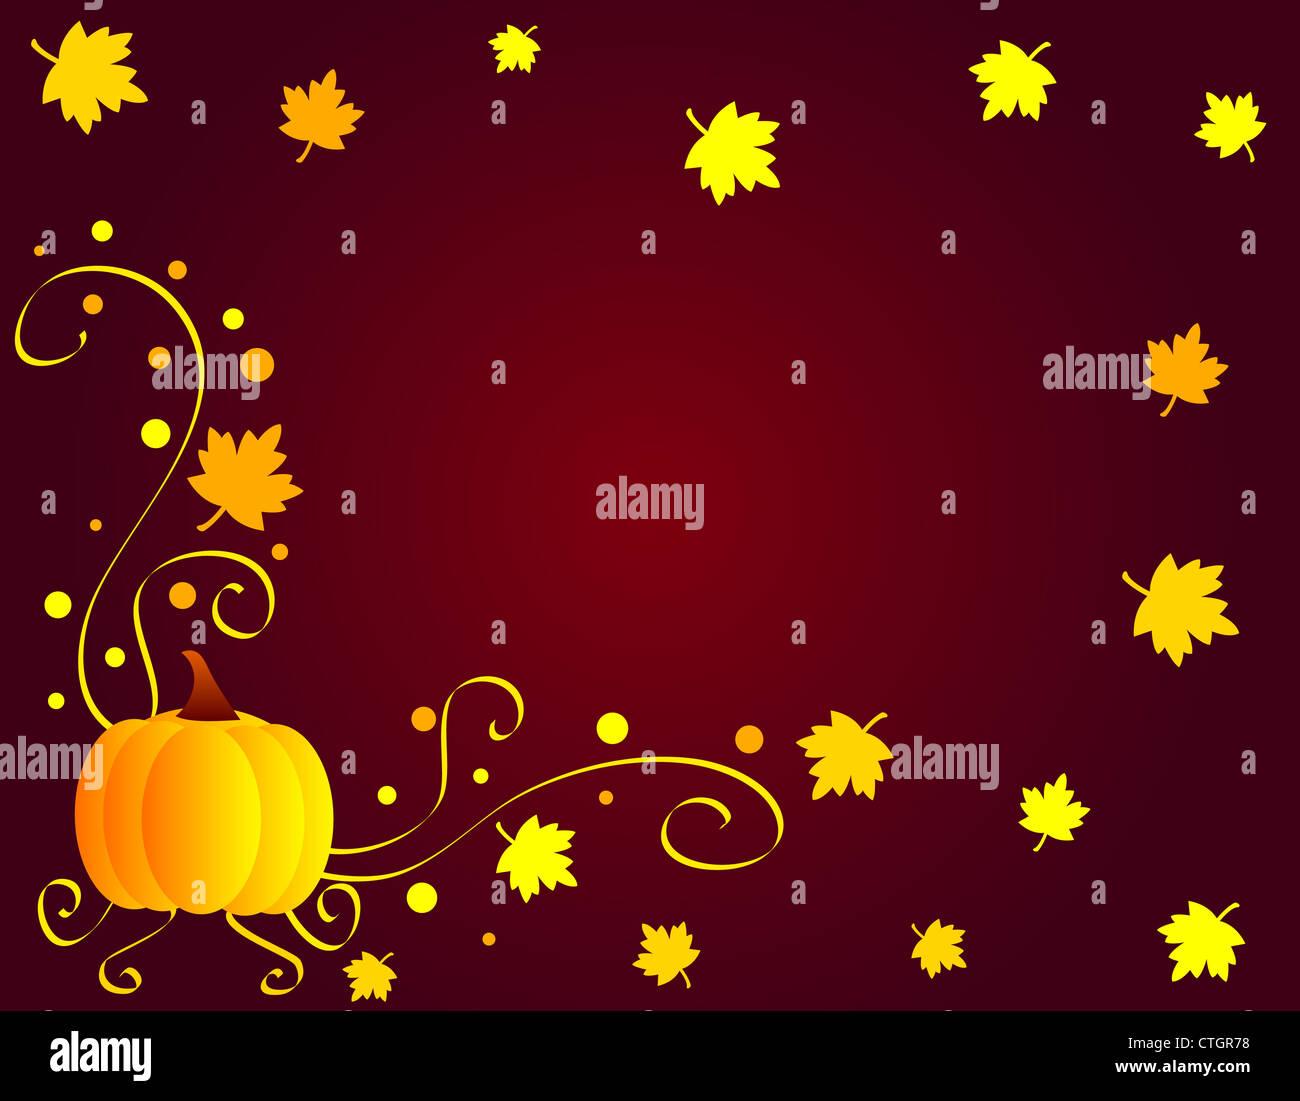 Autumn season maple leaves and pumpkin frame Stock Photo